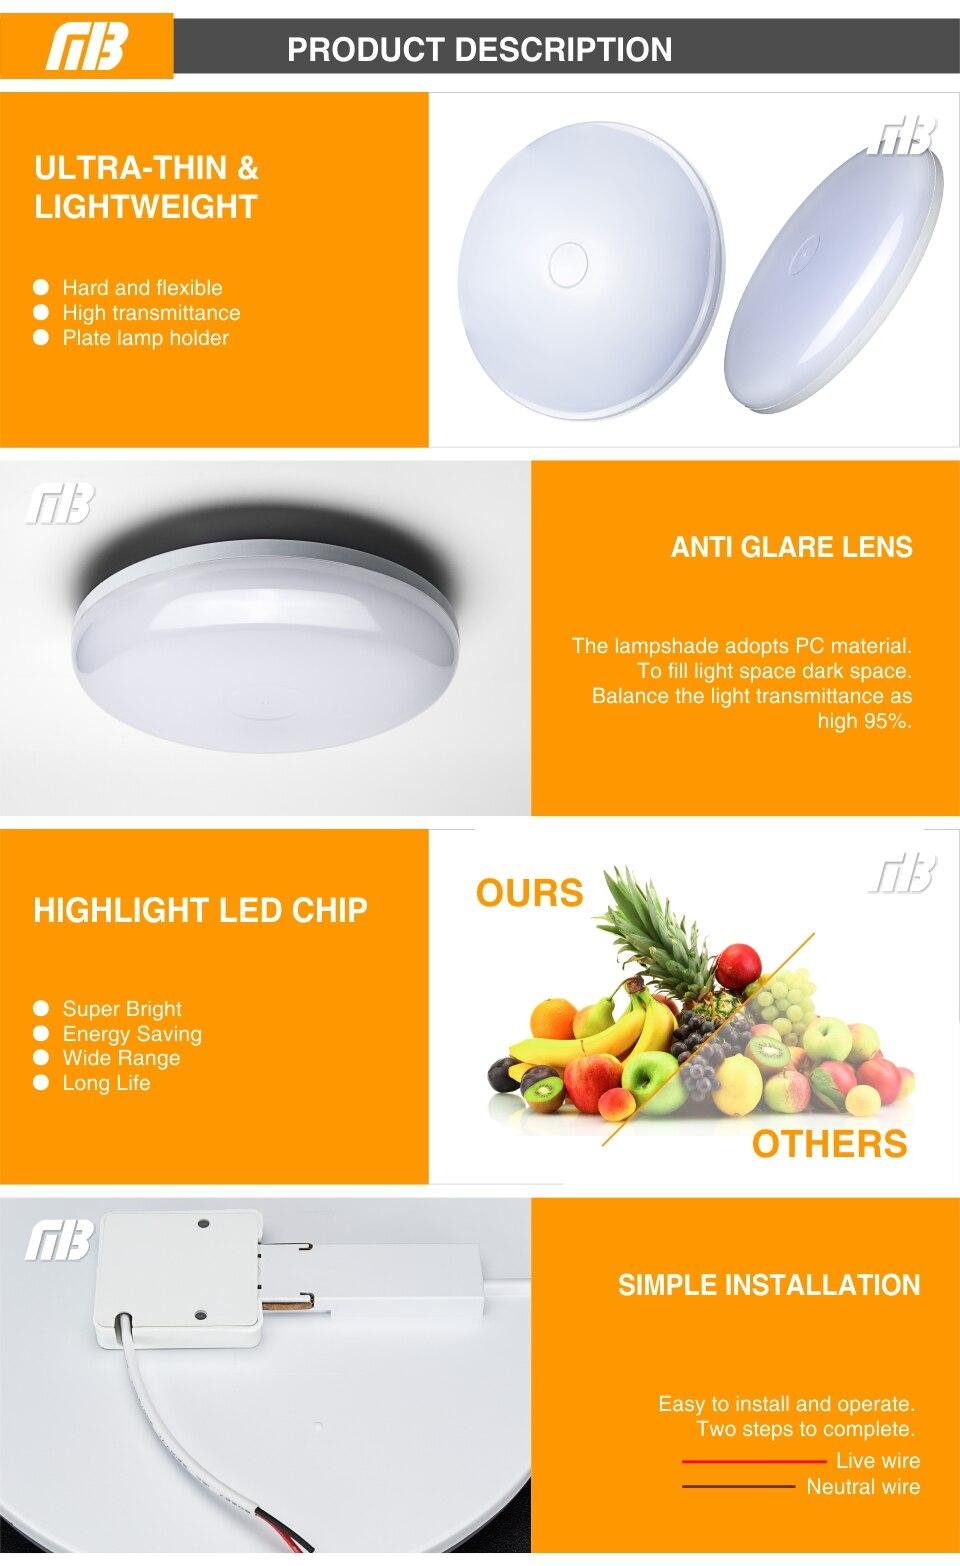 HTB1.bPXRmzqK1RjSZFjq6zlCFXaa Ultra Thin LED Ceiling Lamp LED Modern Panel Light 48W 36W 24W 18W 9W 6W 85-265V Bedroom Kitchen Surface Mount Flush Panel Light